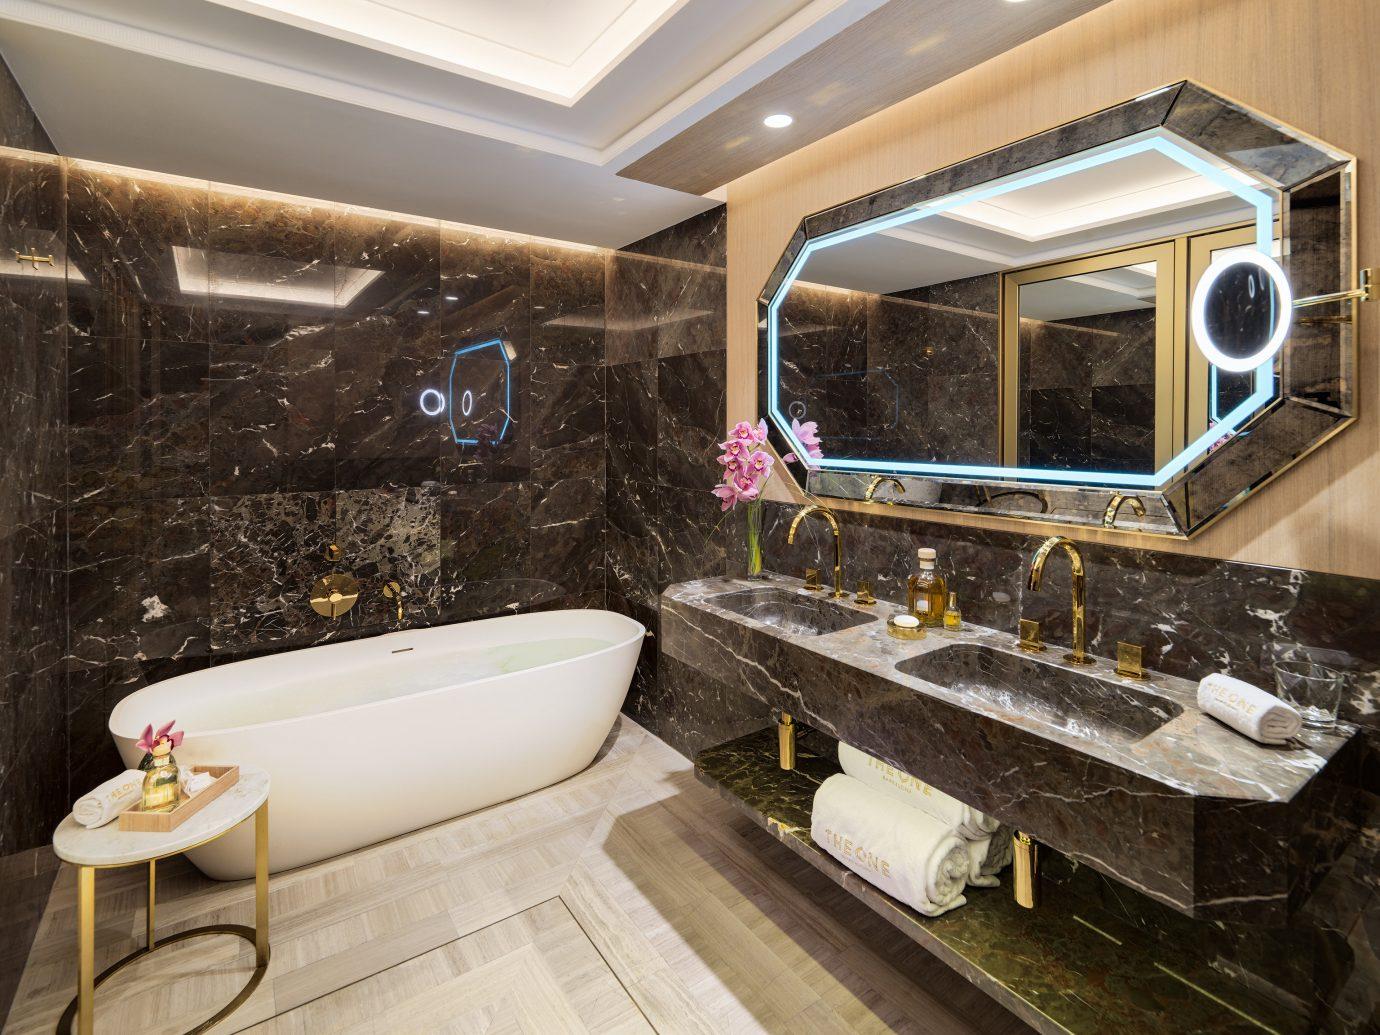 Barcelona Hotels Spain indoor room interior design bathroom estate window interior designer